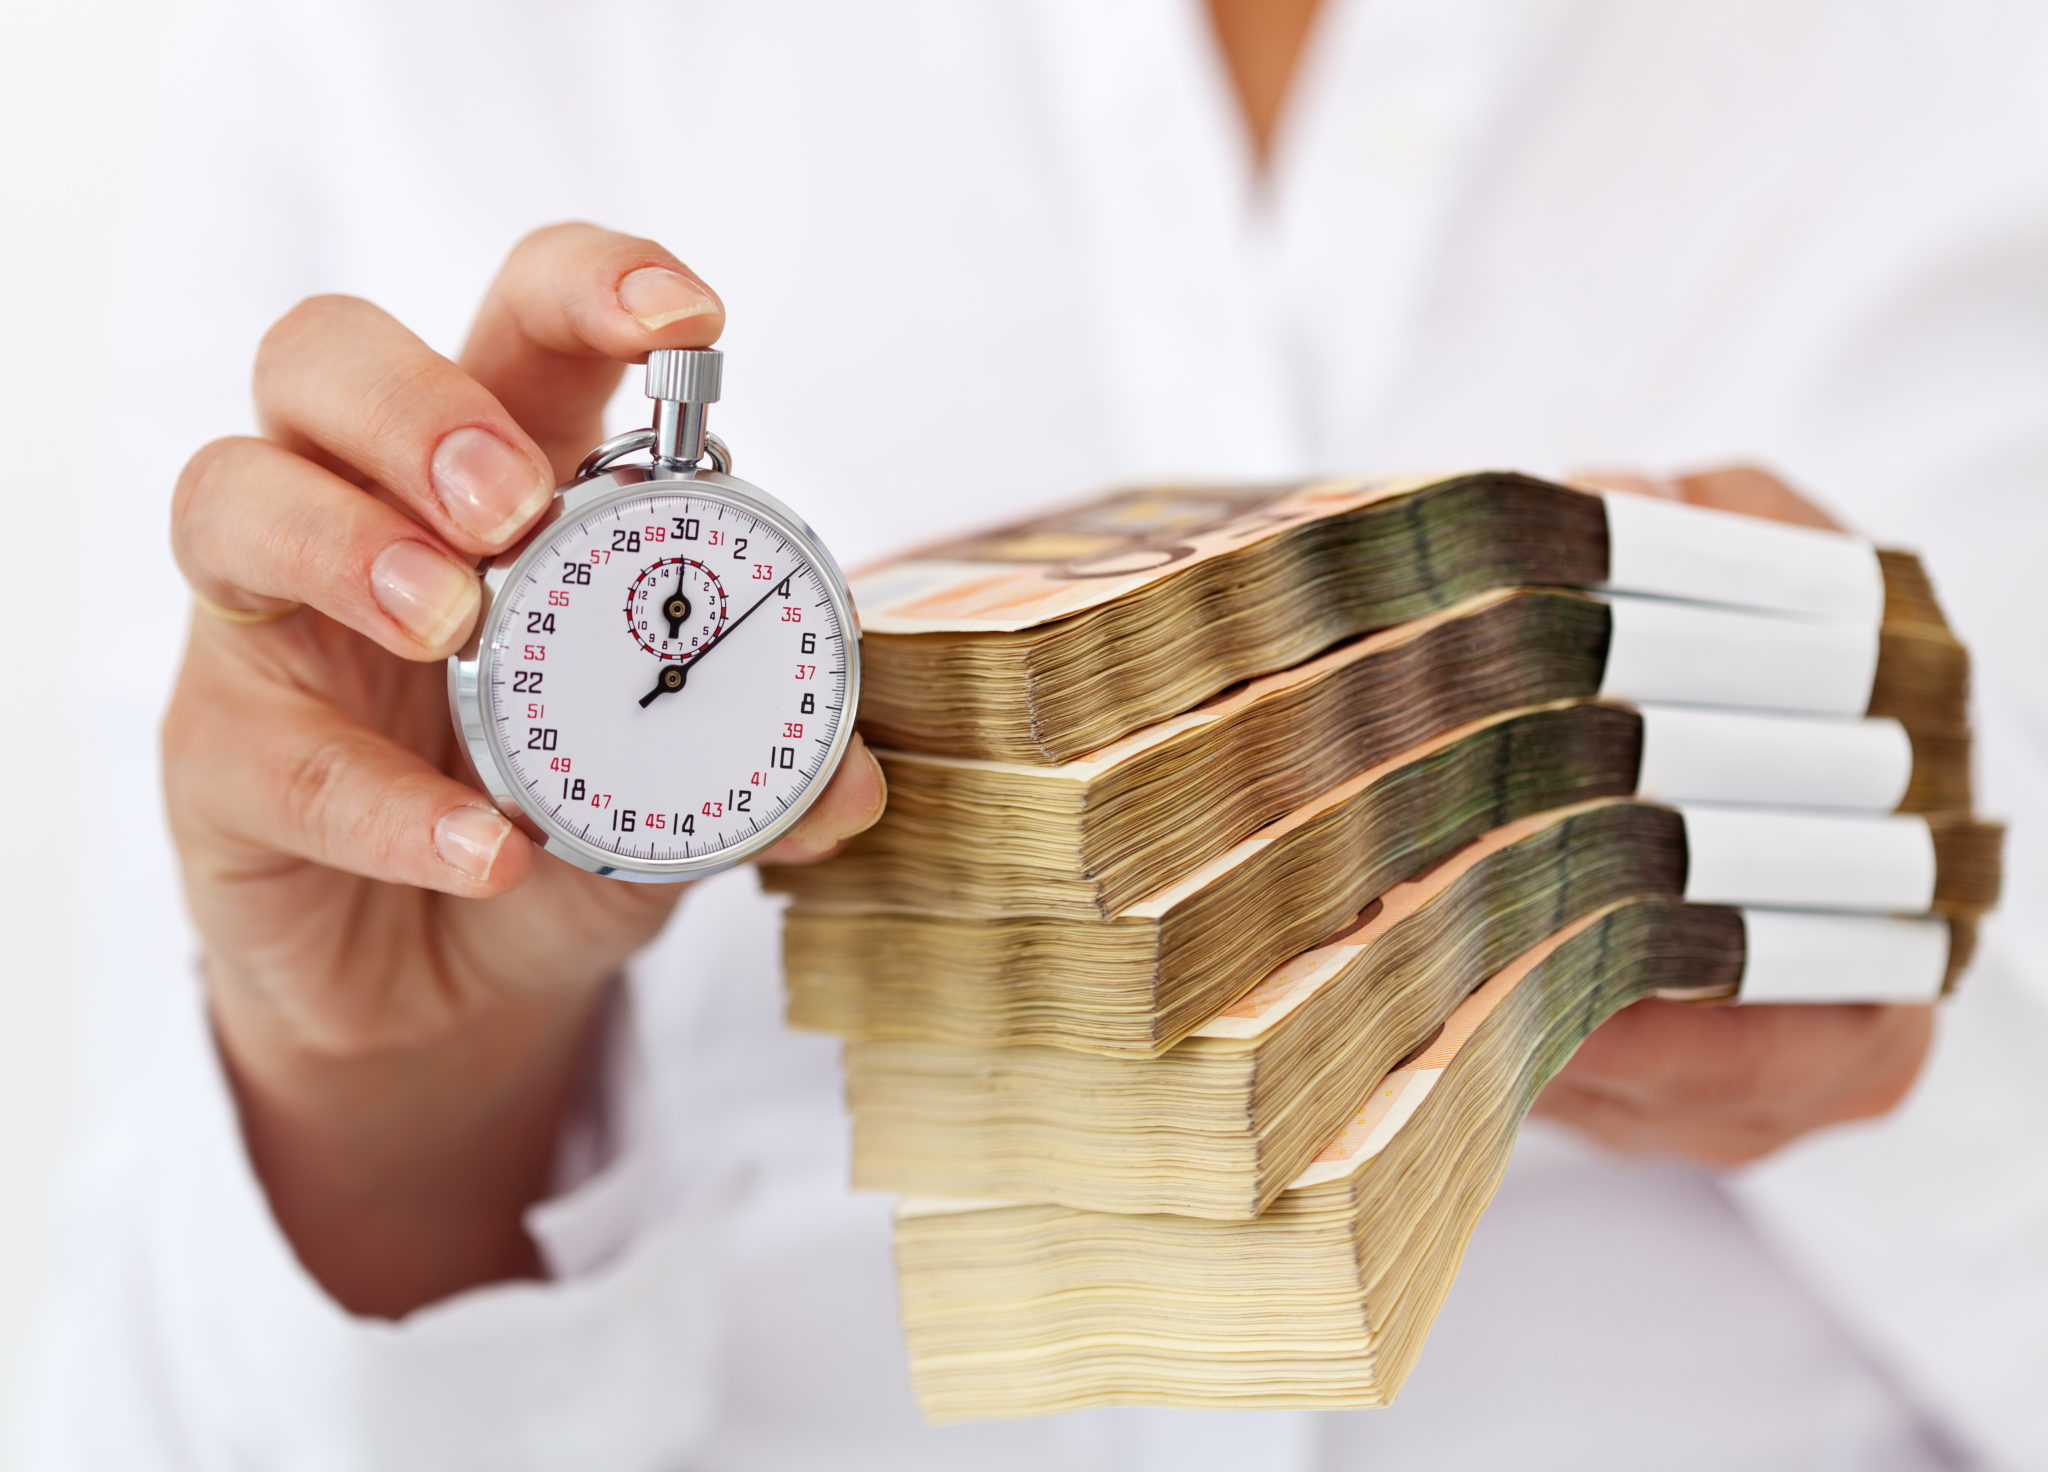 Кредитуем до 5.000.000 рублей по двум удостоверяющим документам